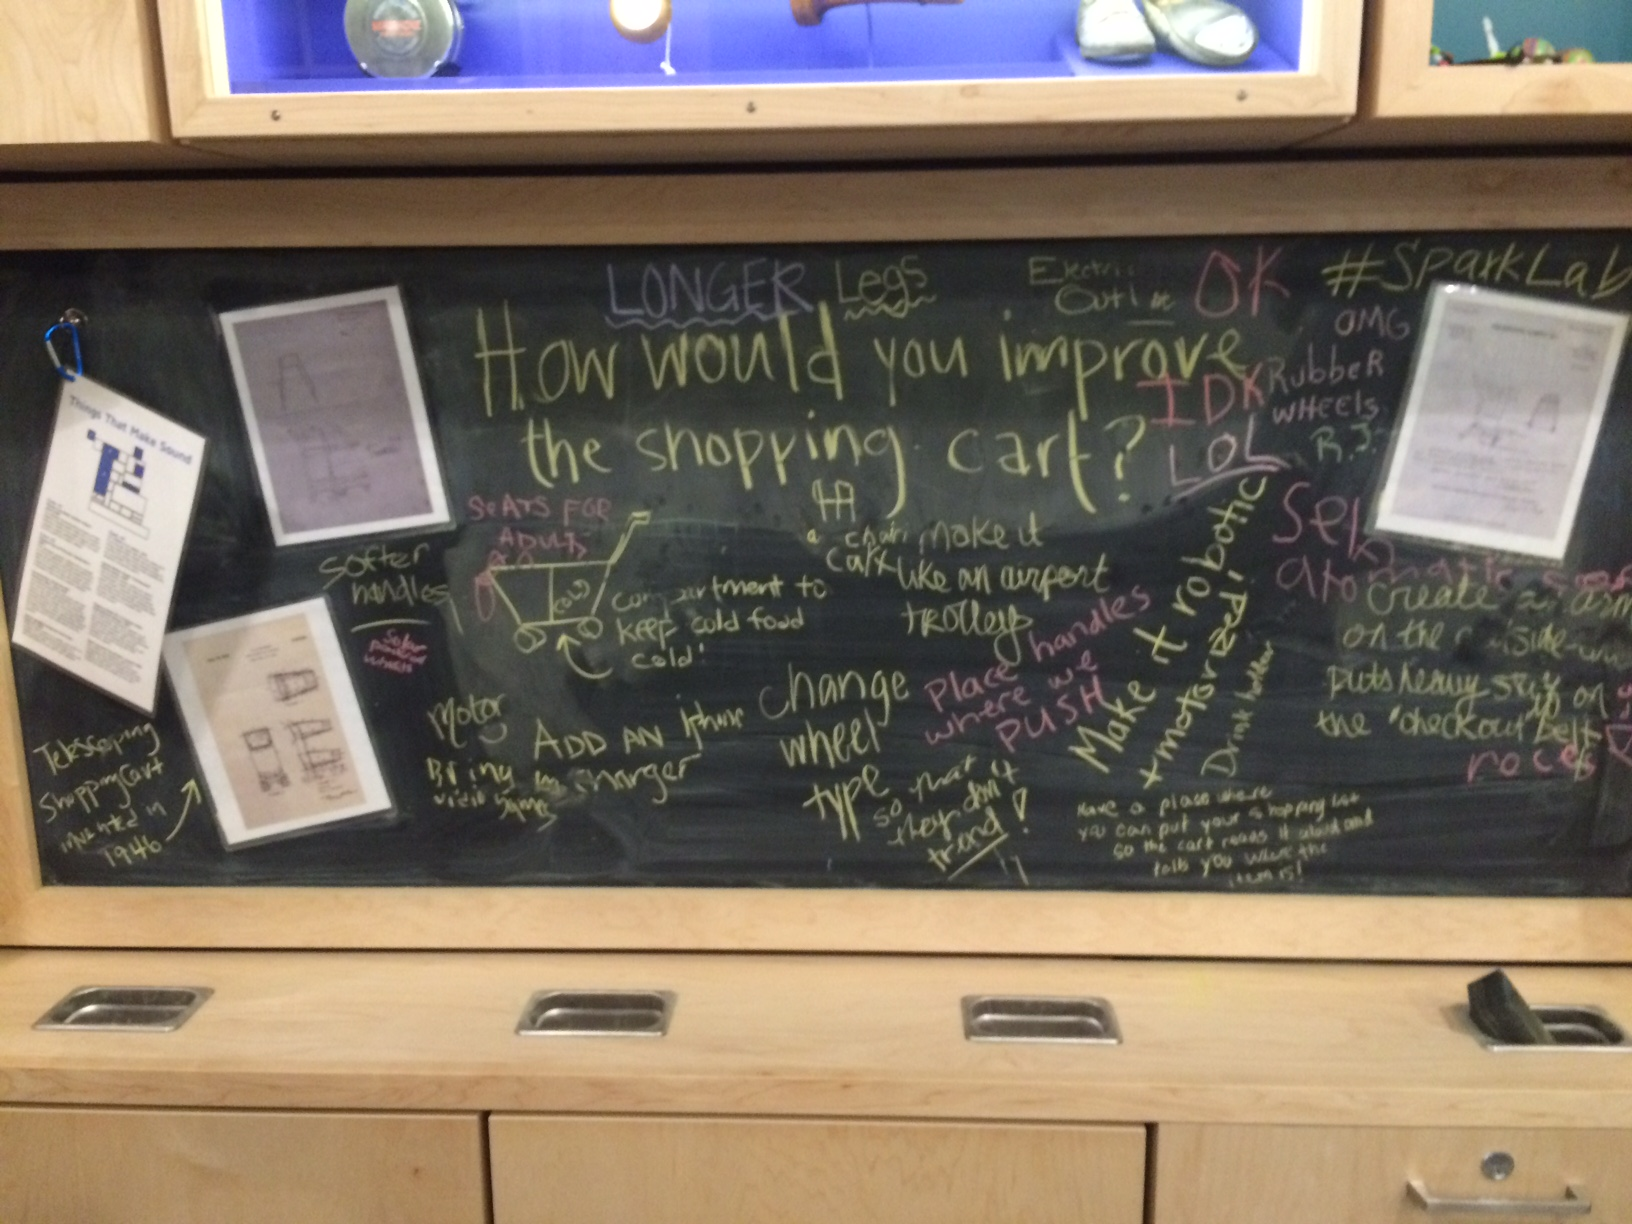 Spark!Lab chalkboard full of visitor ideas